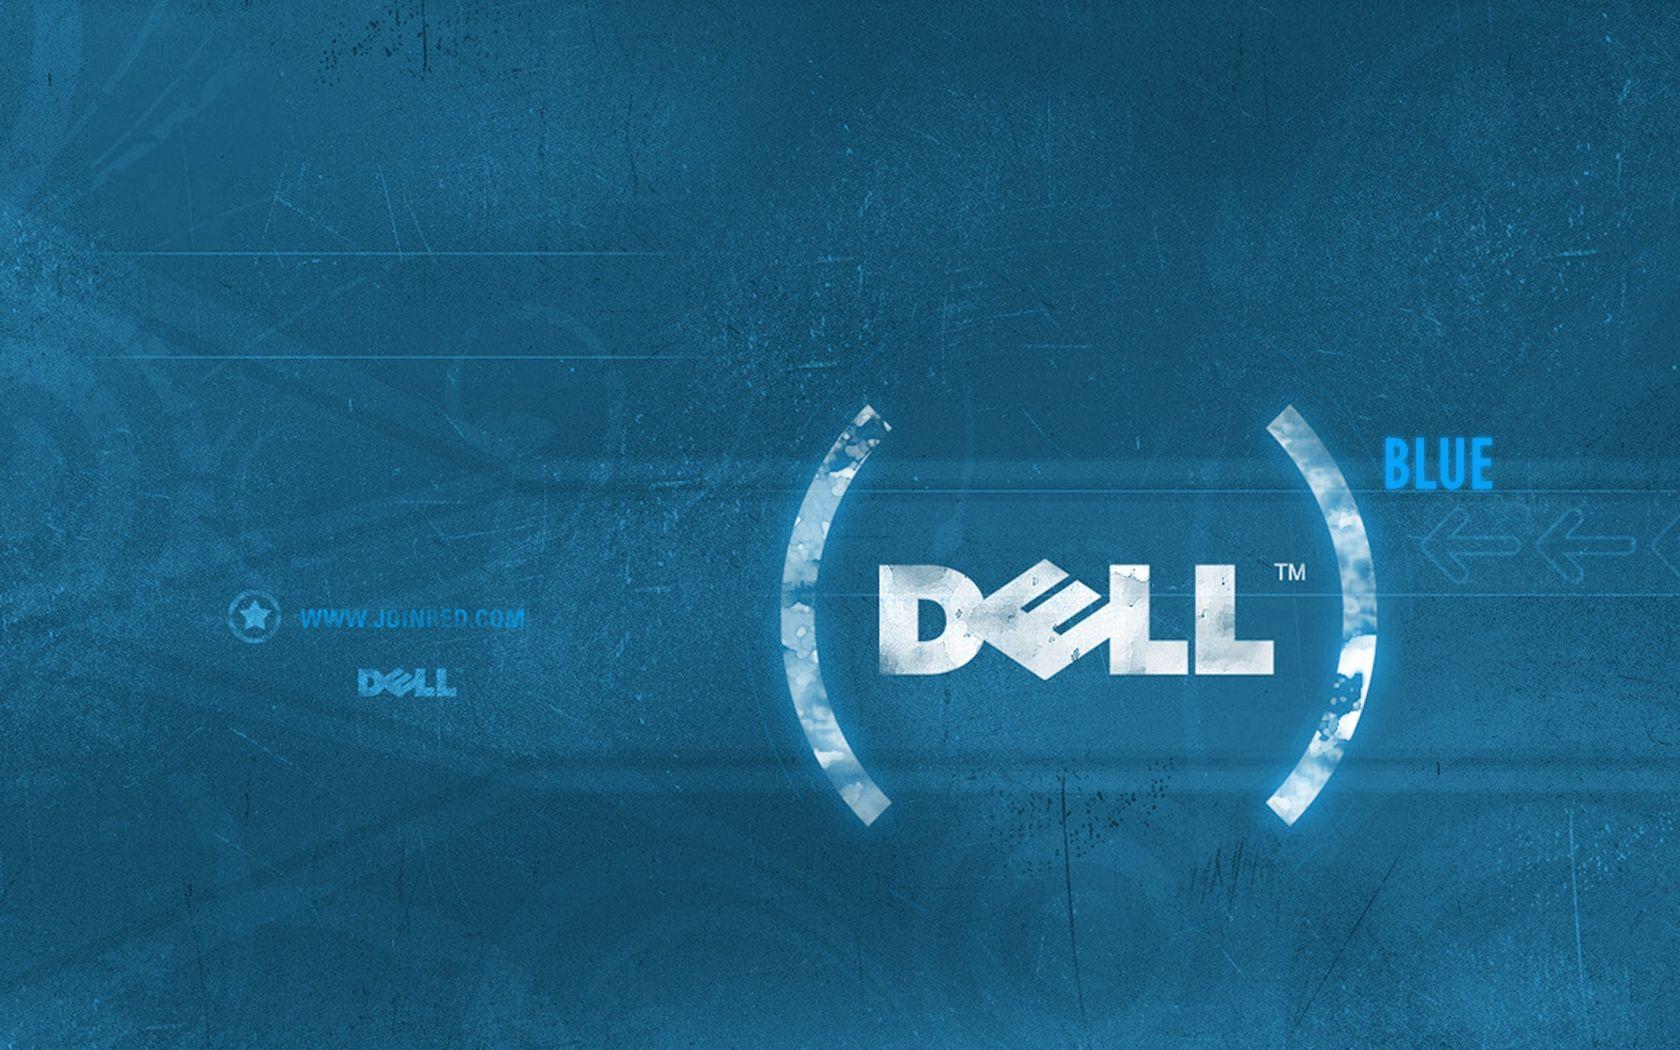 im328 Dell Desktop Backgrounds Wallpapers 1680x1050   Picseriocom 1680x1050